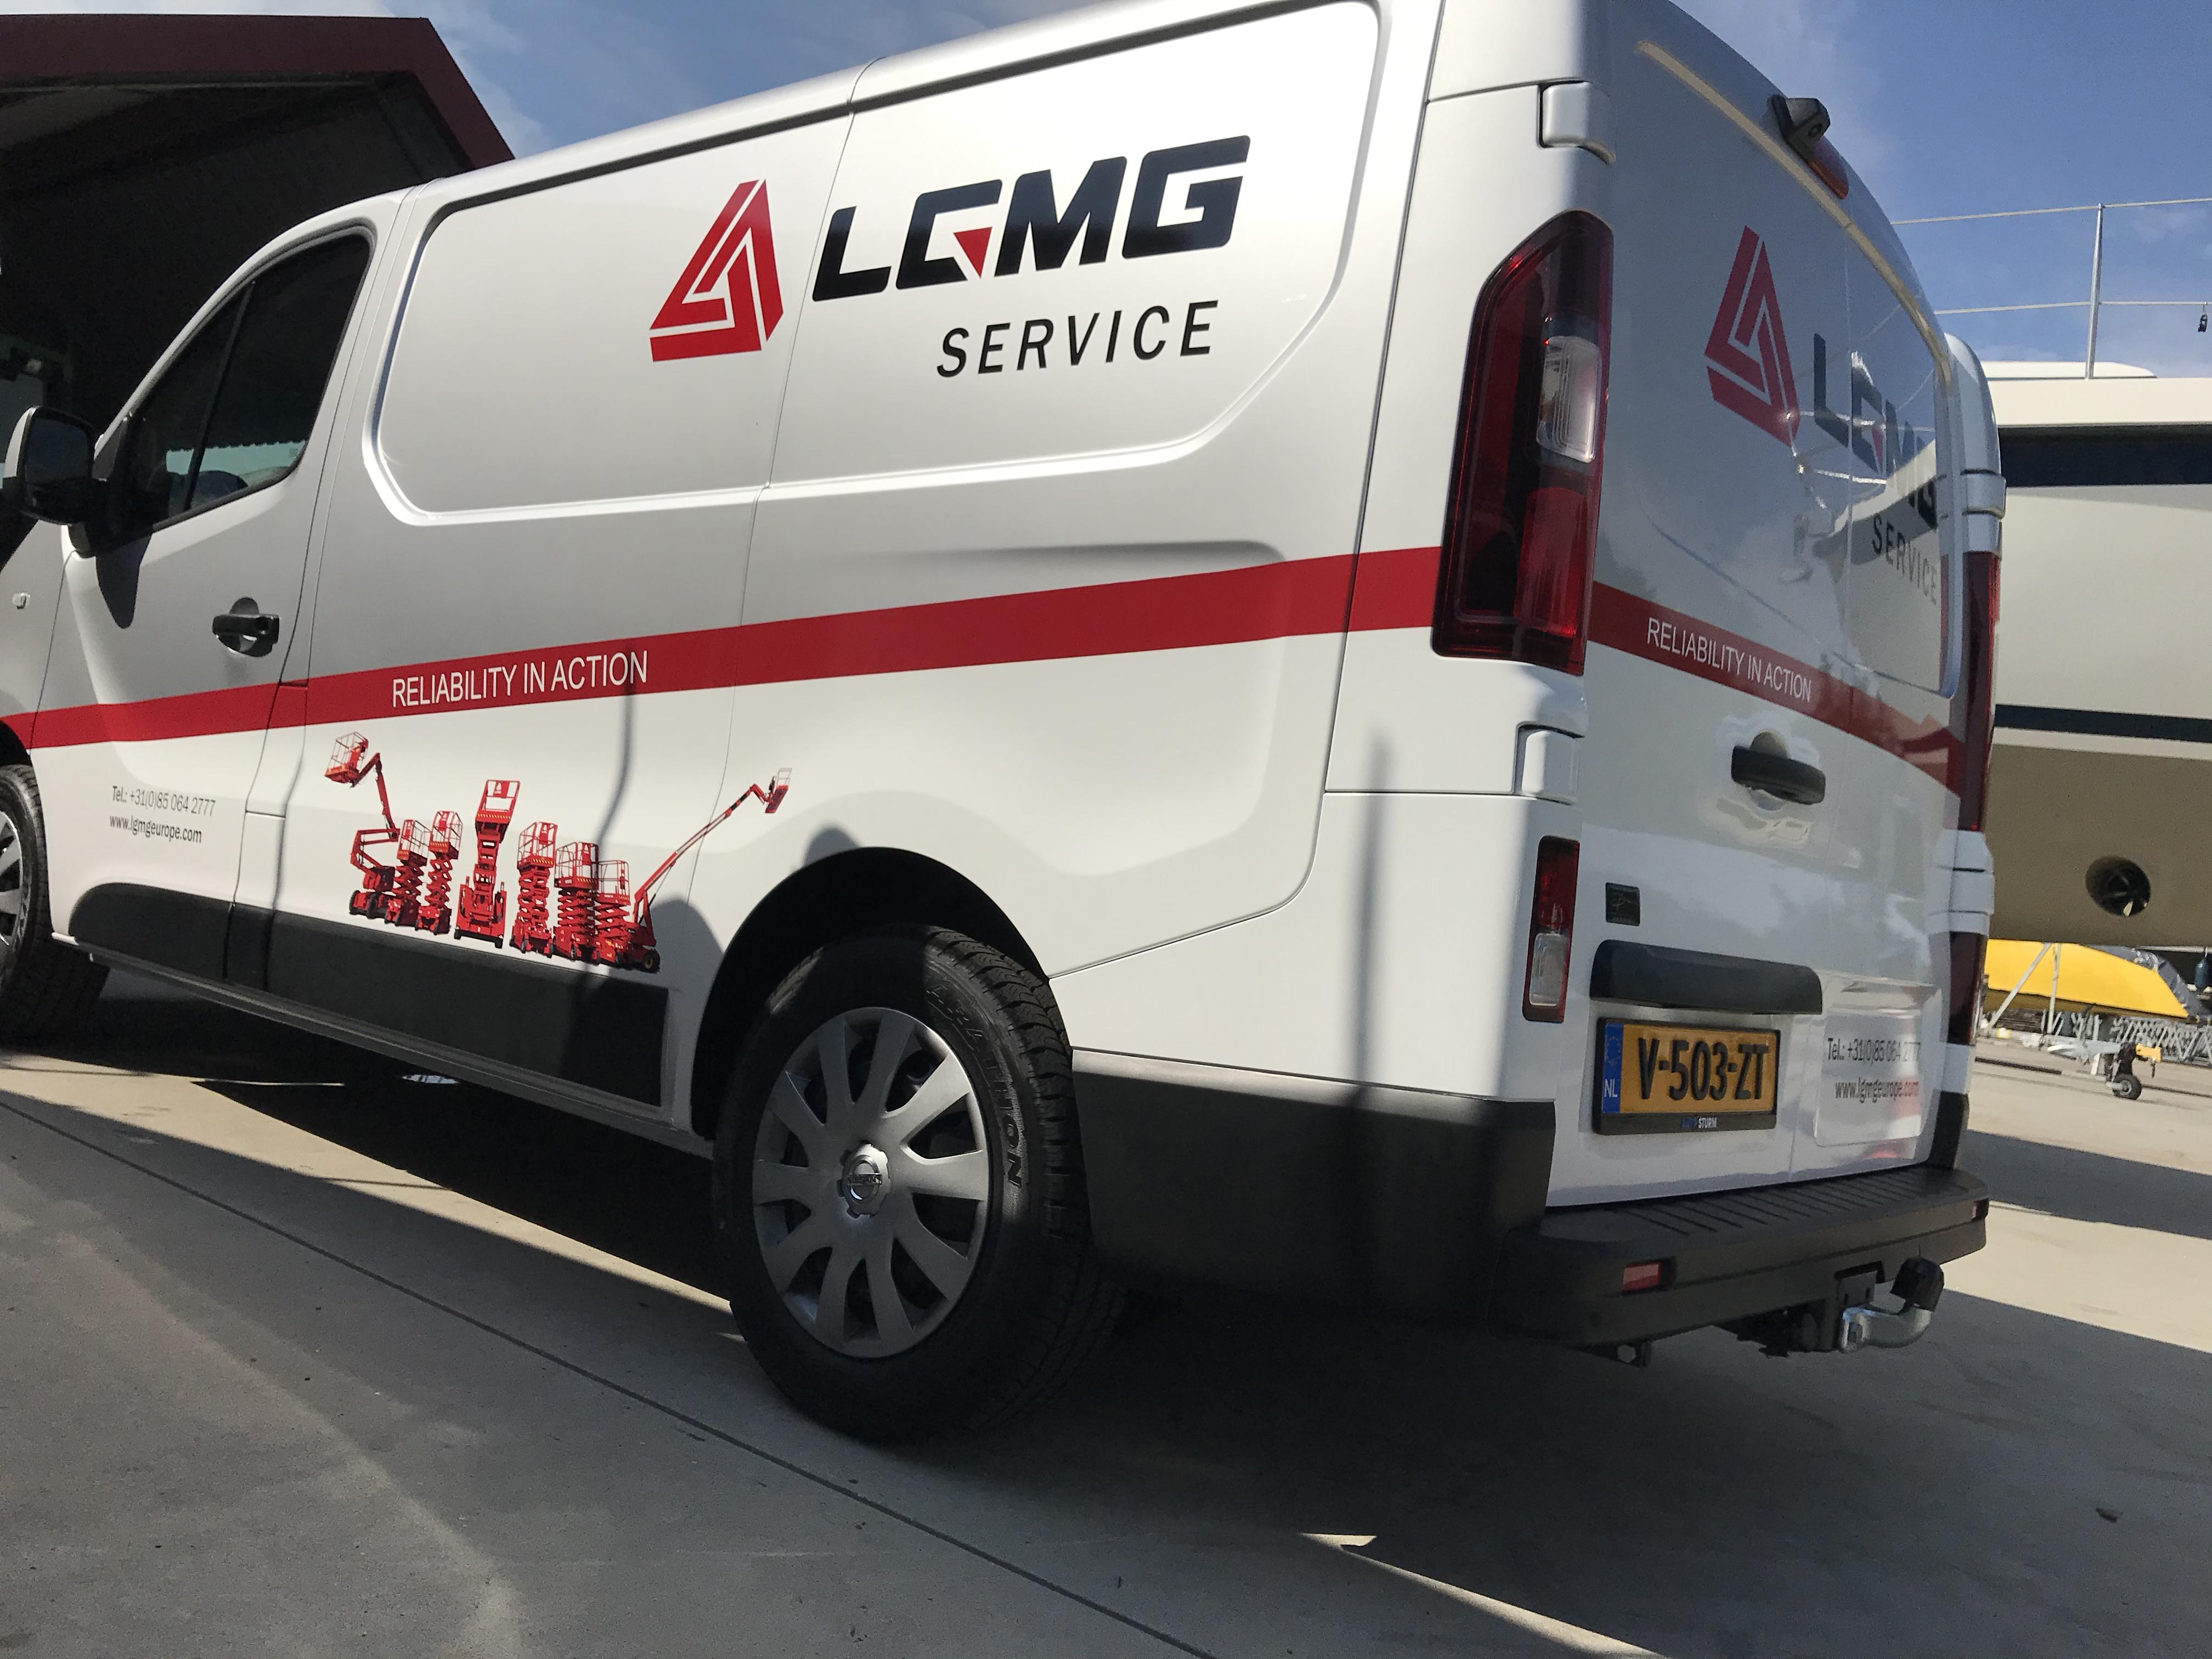 Servicebus LGMG